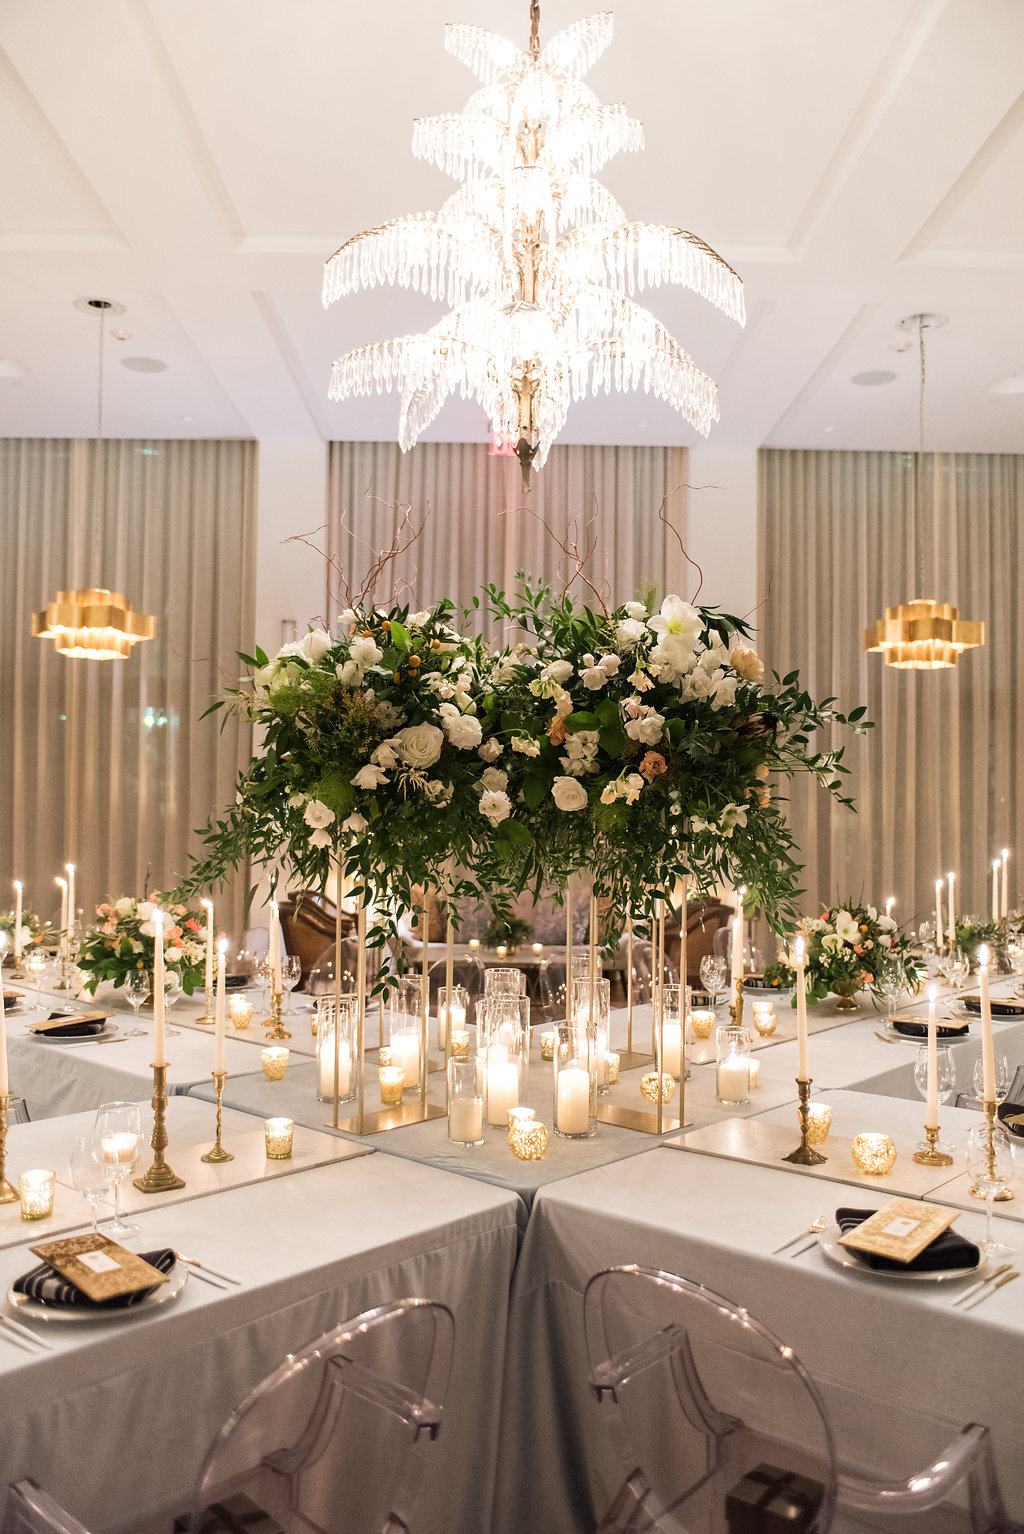 Charleston Wedding Week 2017: An Evening with Tara Guérard, Darcy Miller, & Mindy Weiss - Charleston Wedding Week